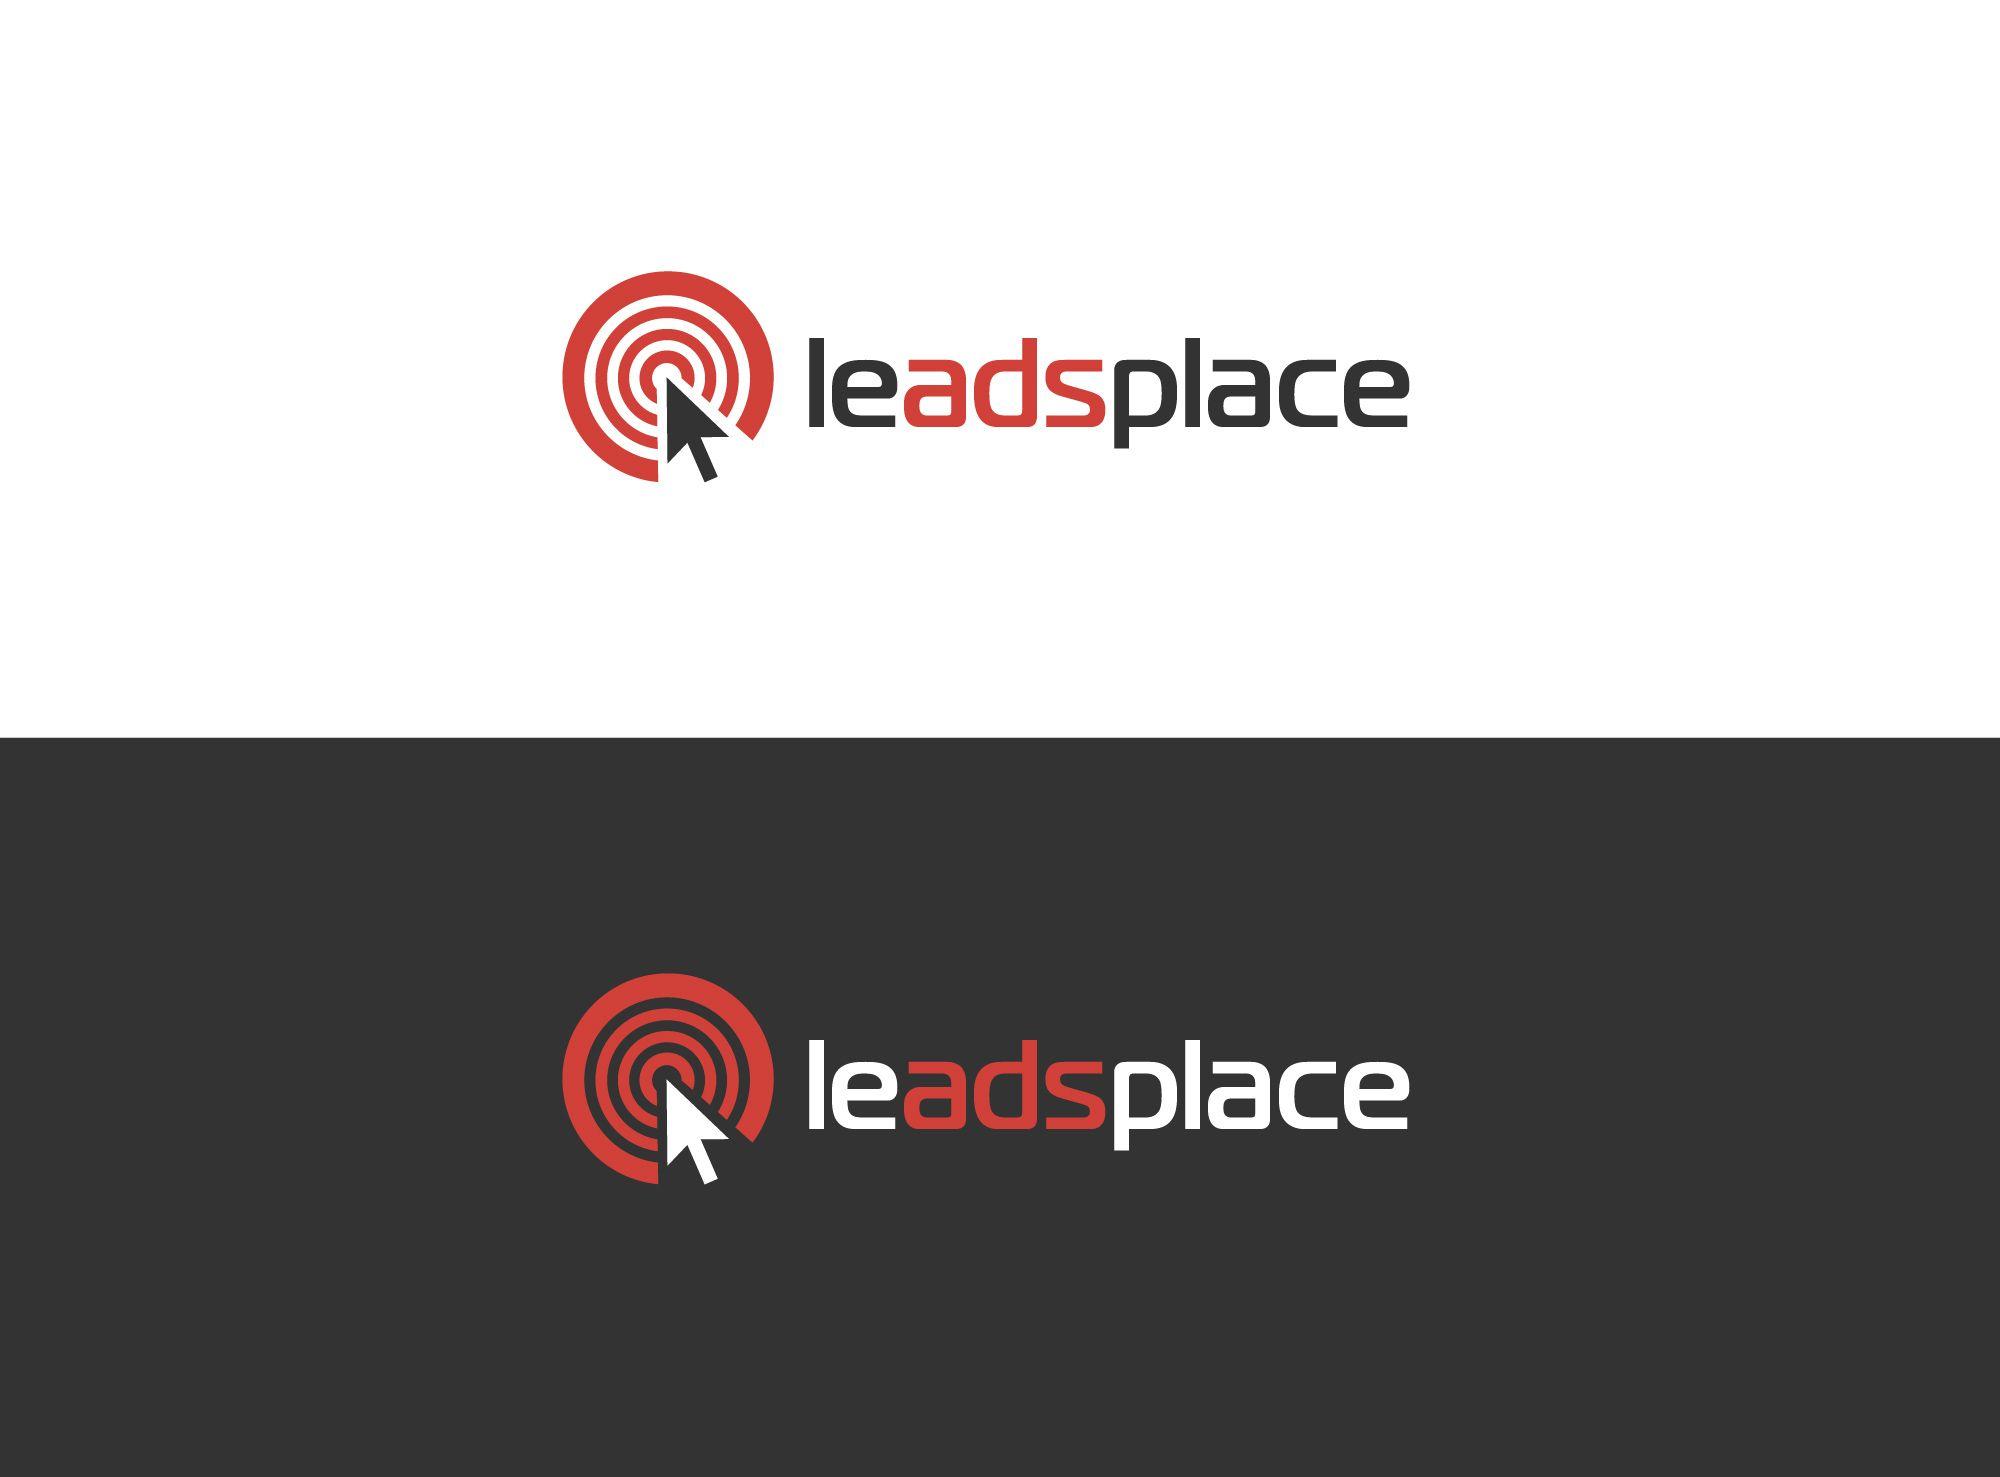 leadsplace.com - логотип - дизайнер Tom_Riddle